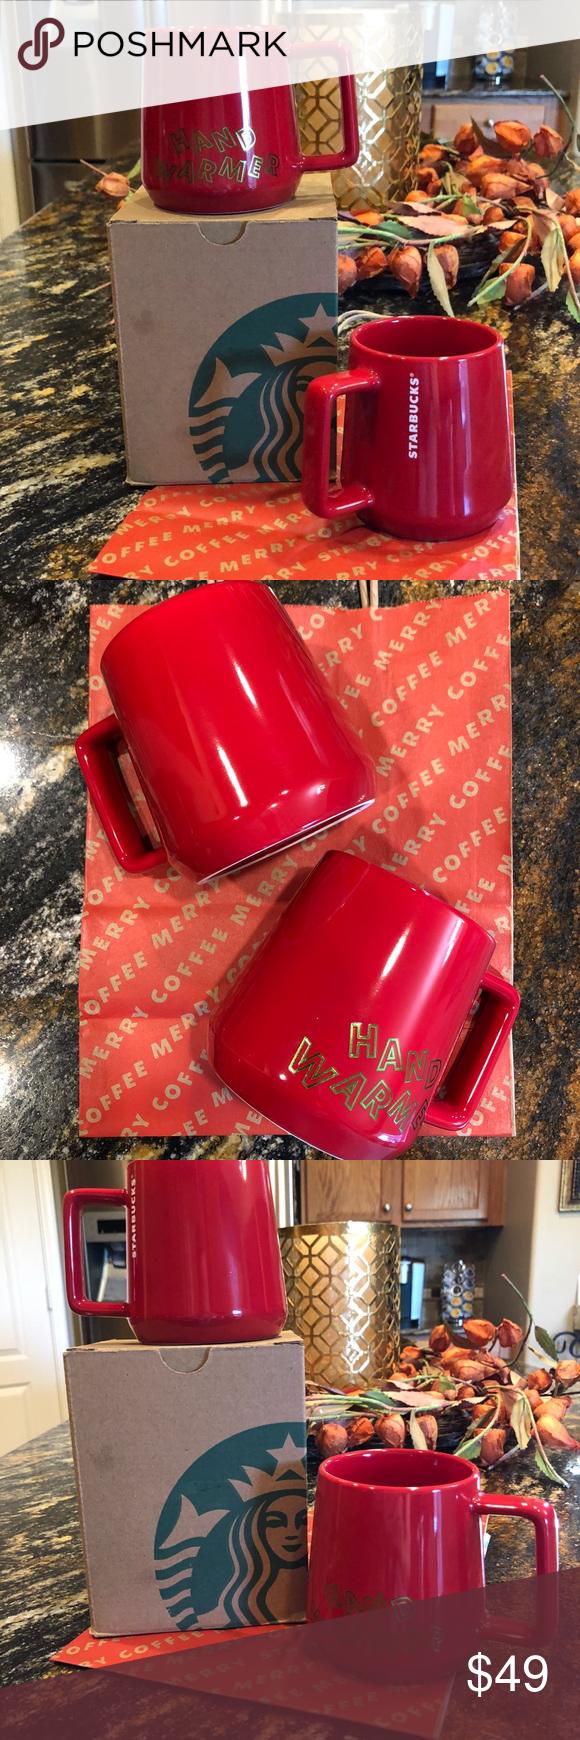 Price FIRM New Starbucks Hand Warmer Coffee Mugs NWT in